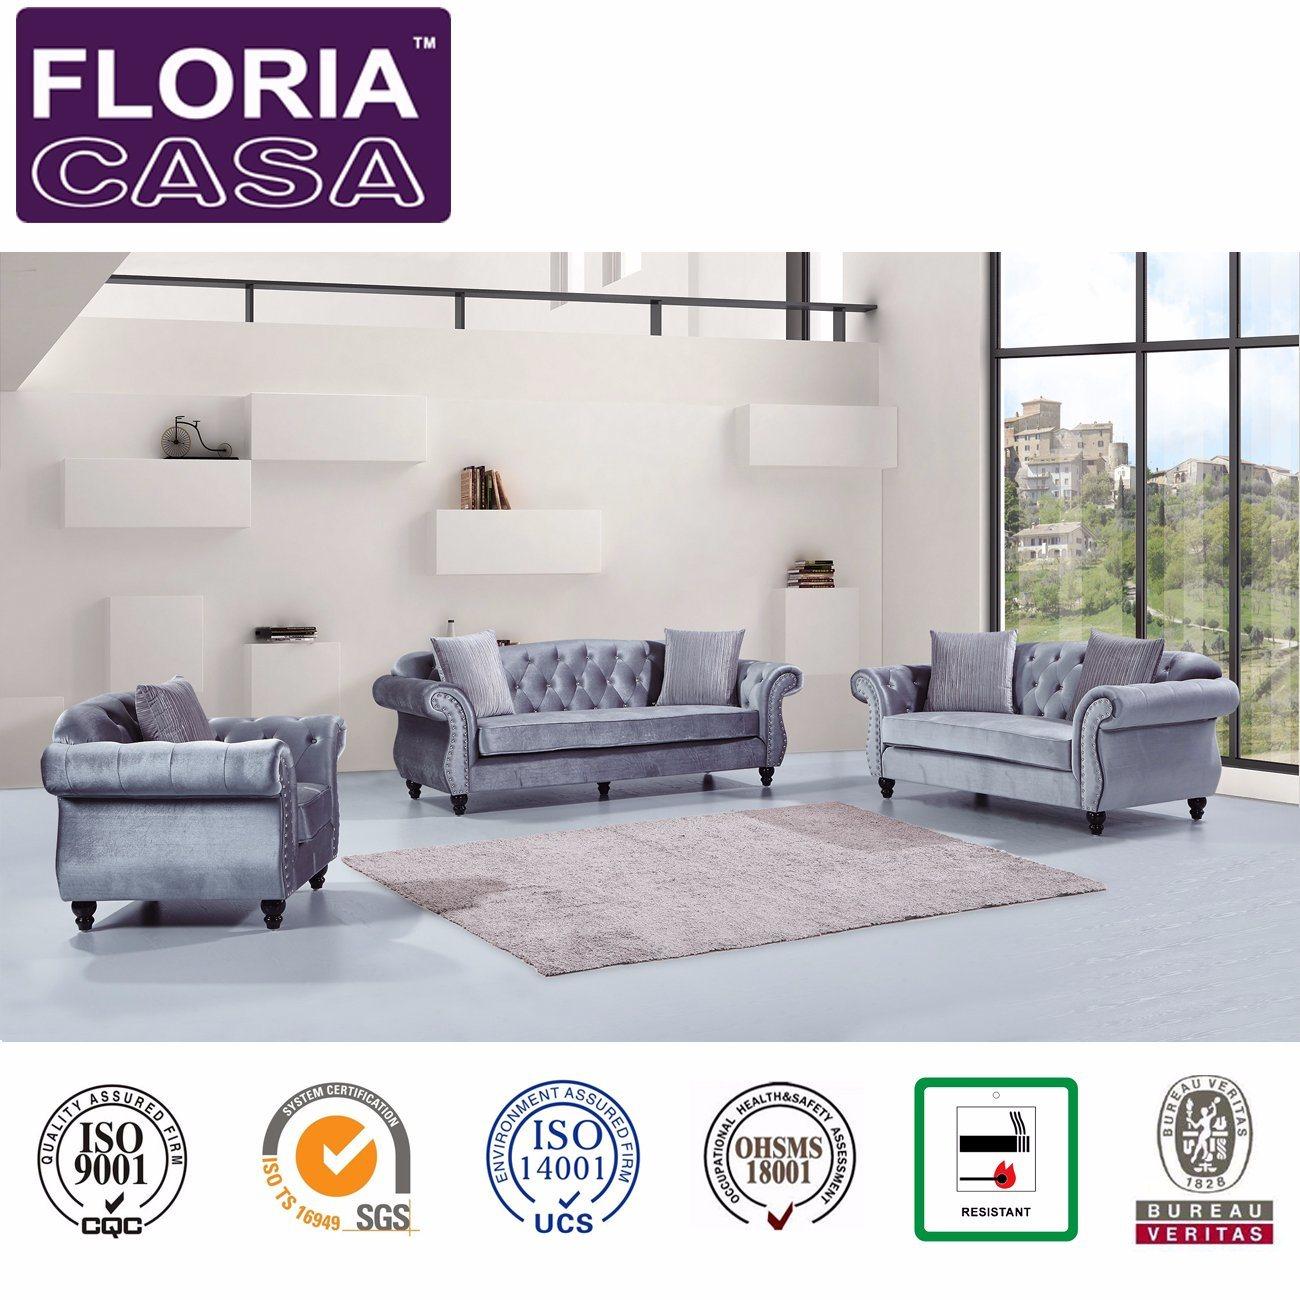 [Hot Item] Divani Casa Classical Home Furniture Velvet Fabric Chesterfield  Sofa